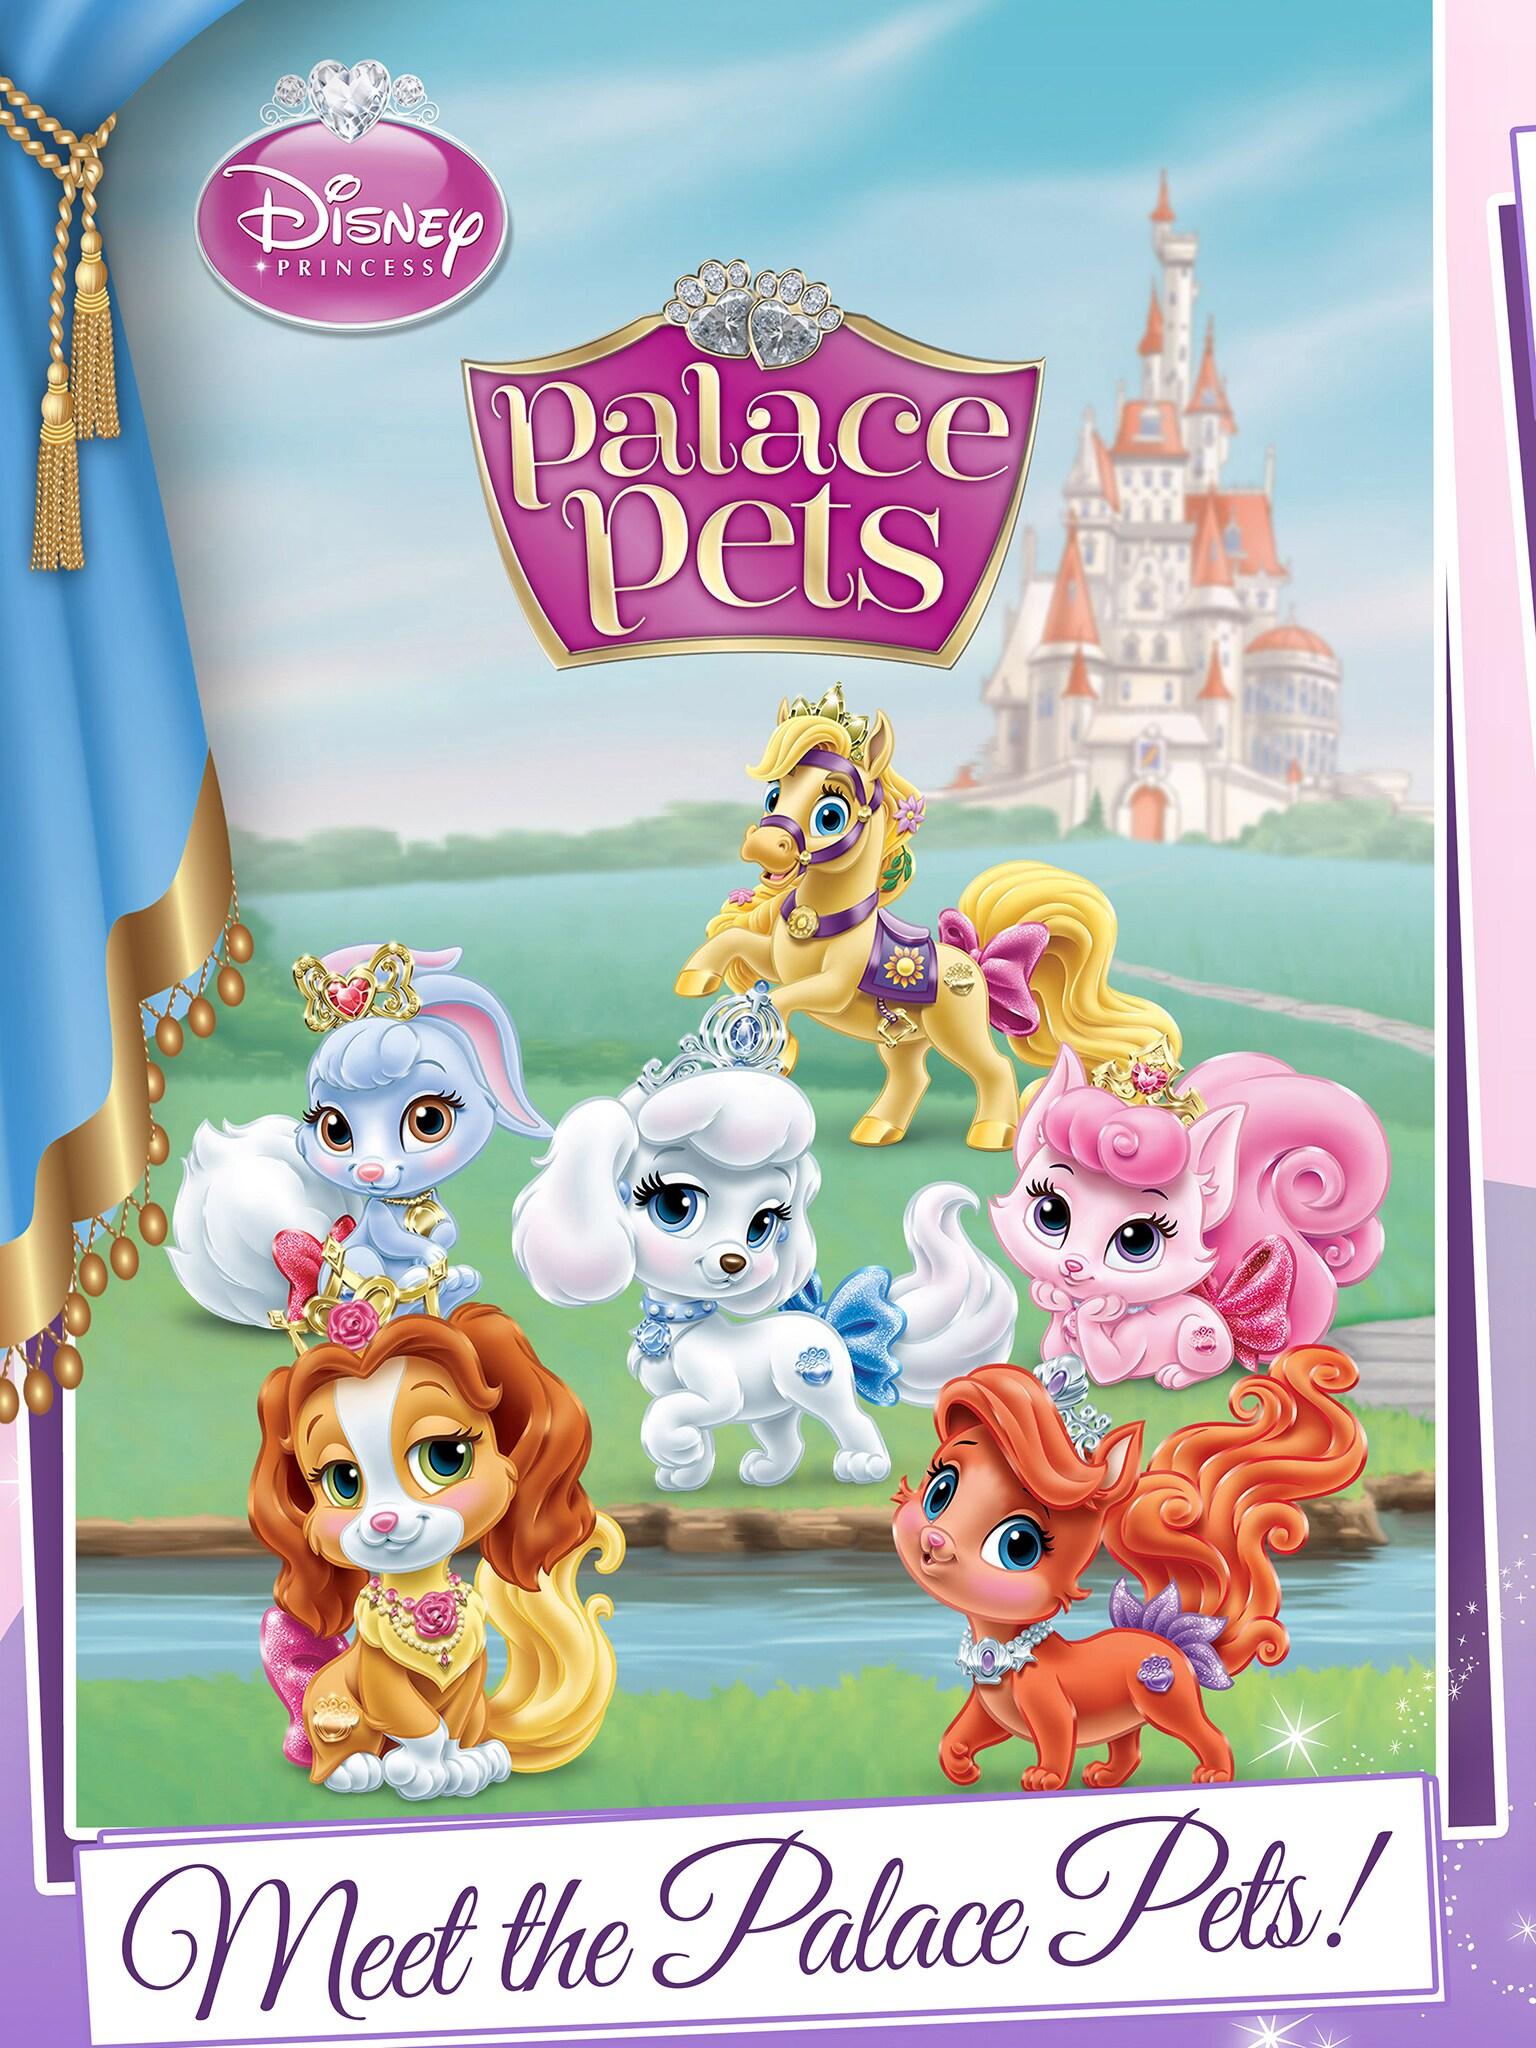 Palace Pets Photo Gallery | Disney Australia Games